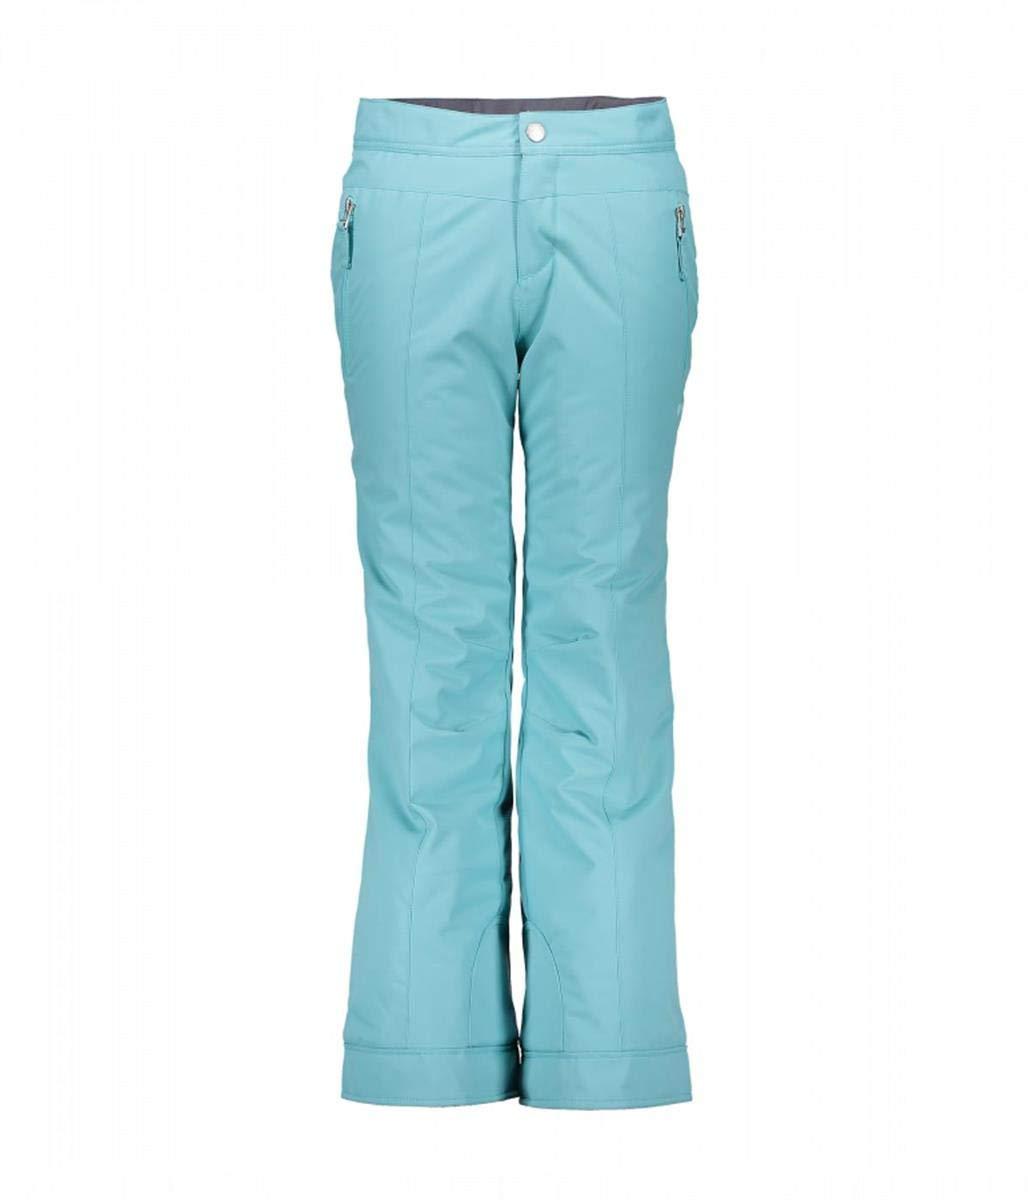 Obermeyer Brooke Ski Pant Girls by Obermeyer